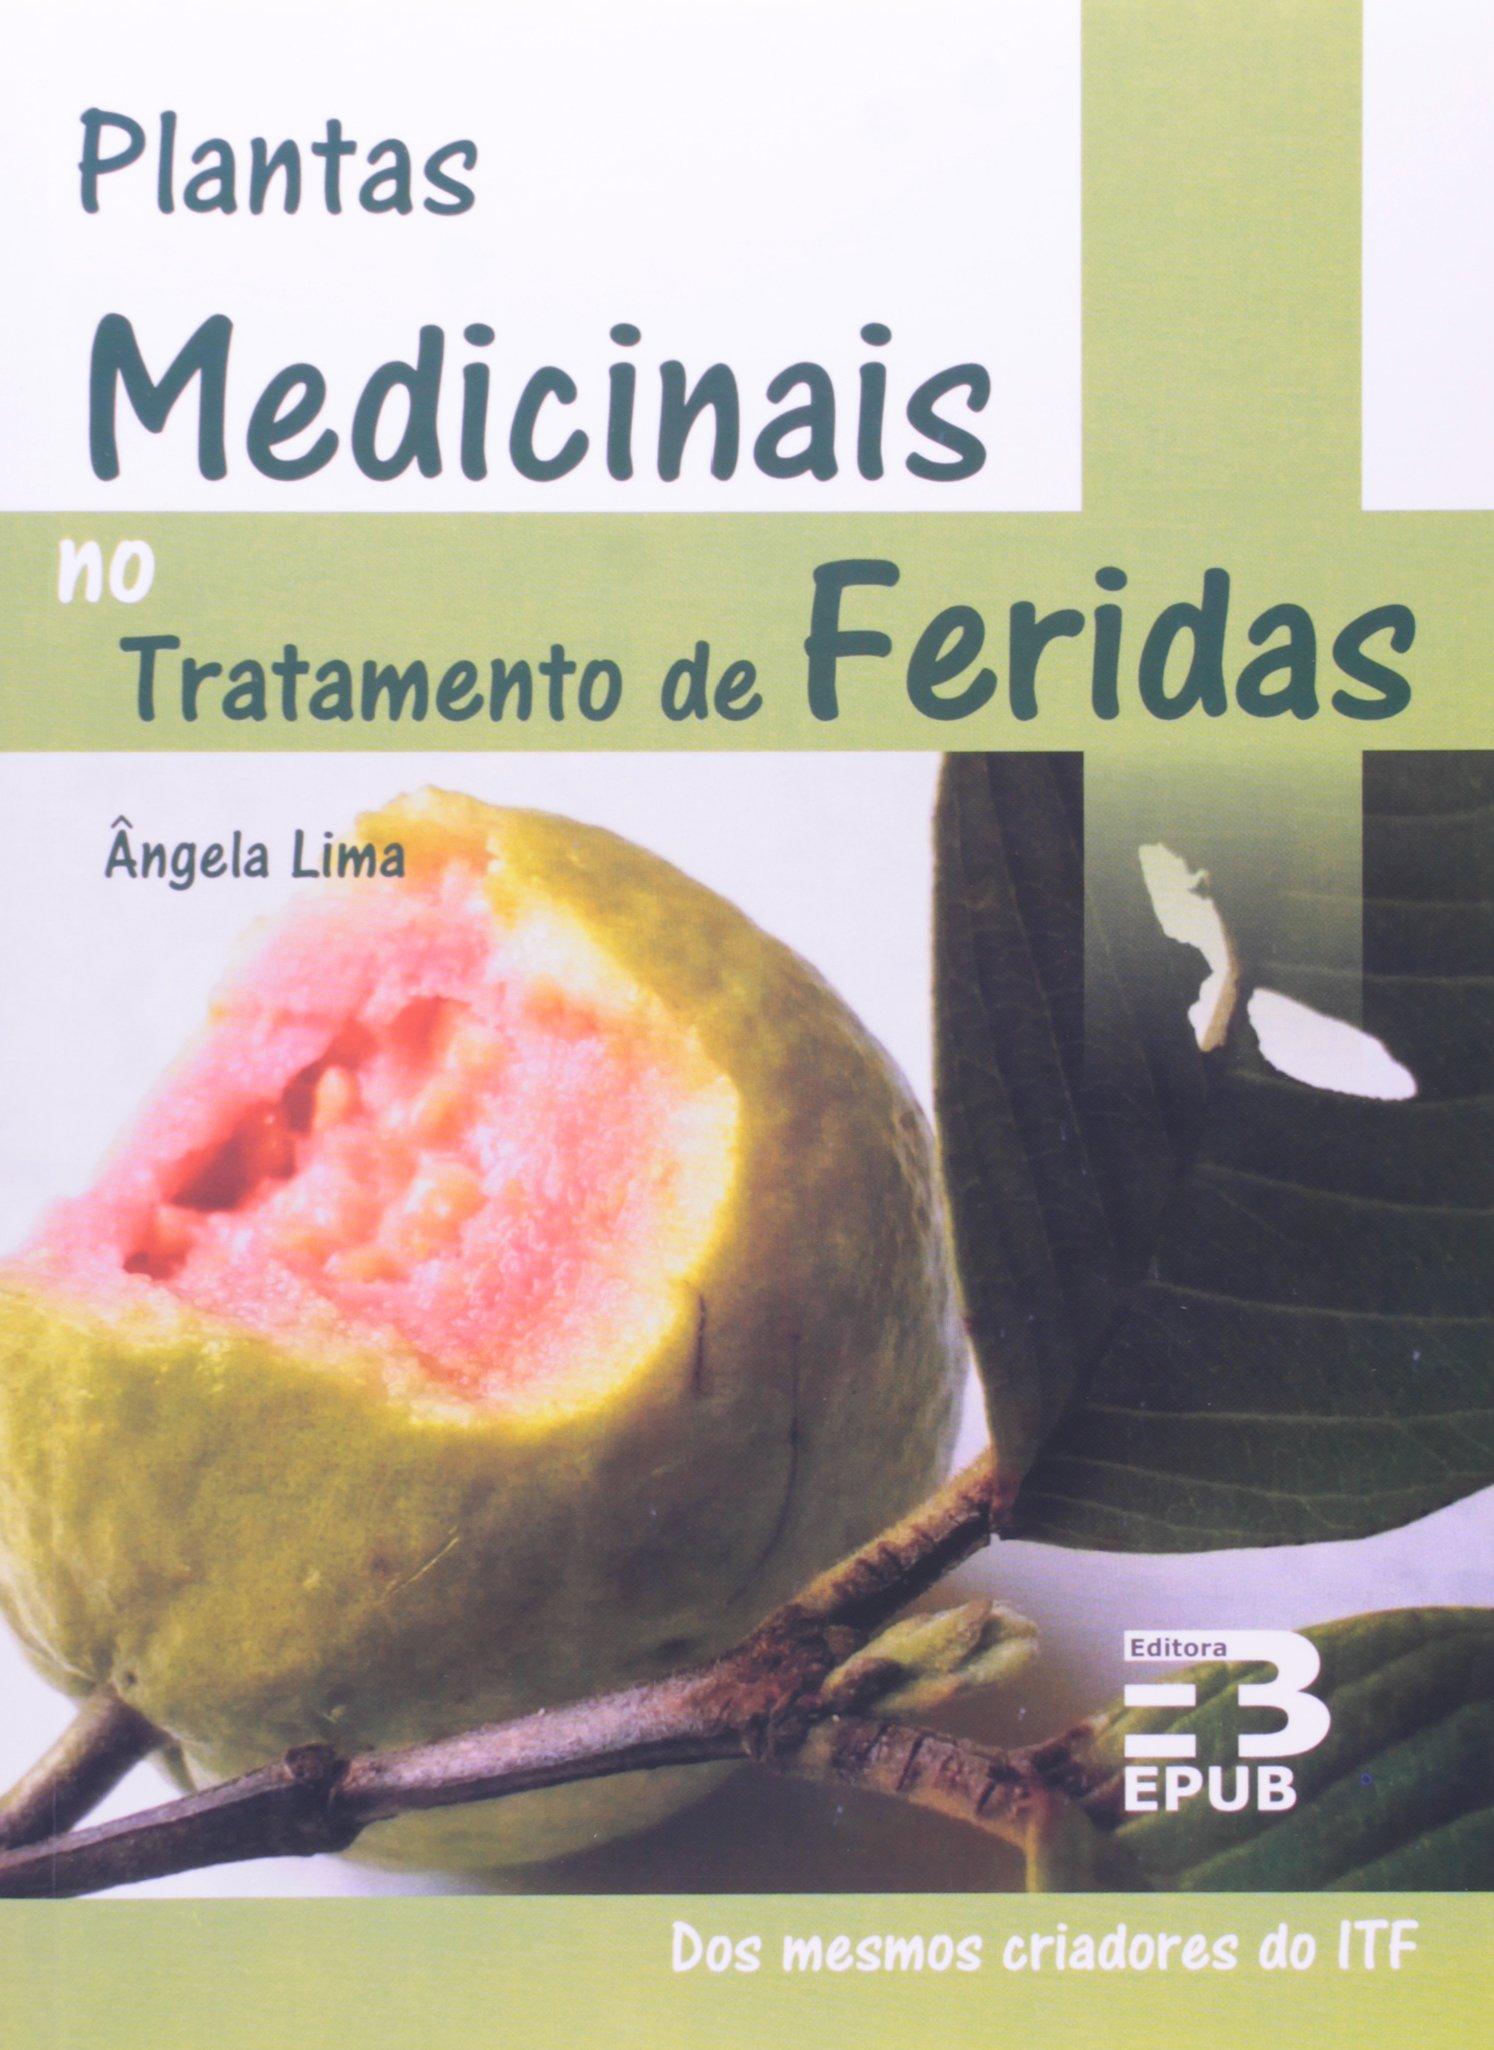 Plantas Medicinais No Tratamento De Feridas: Marta Batista: 9788587098870: Amazon.com: Books